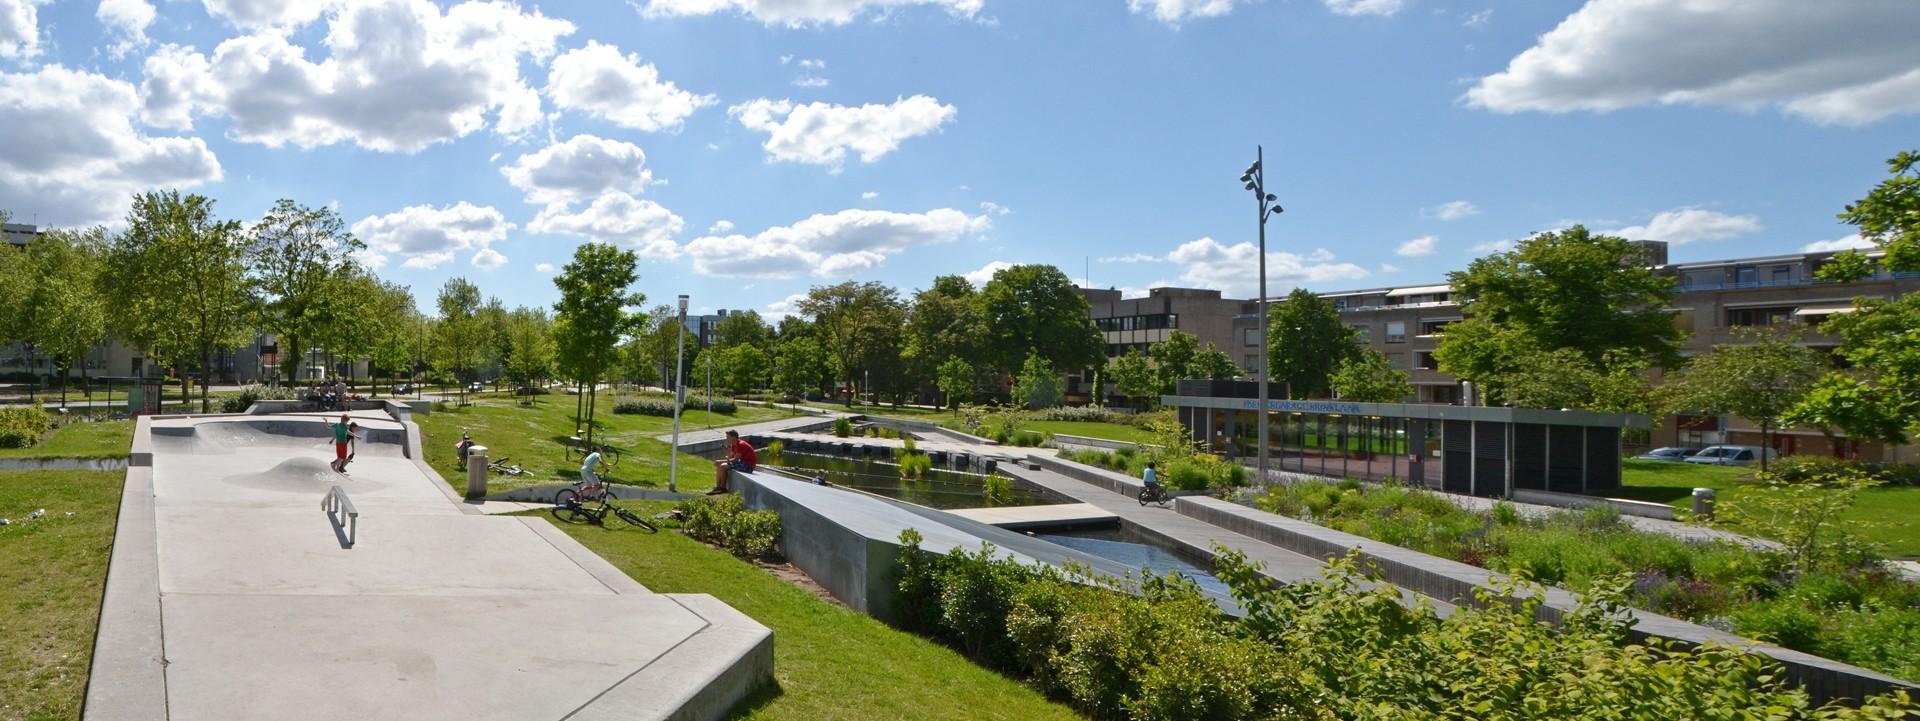 Catharina-Amalia-Park-Apeldoorn-OKRA-overview-1920×721